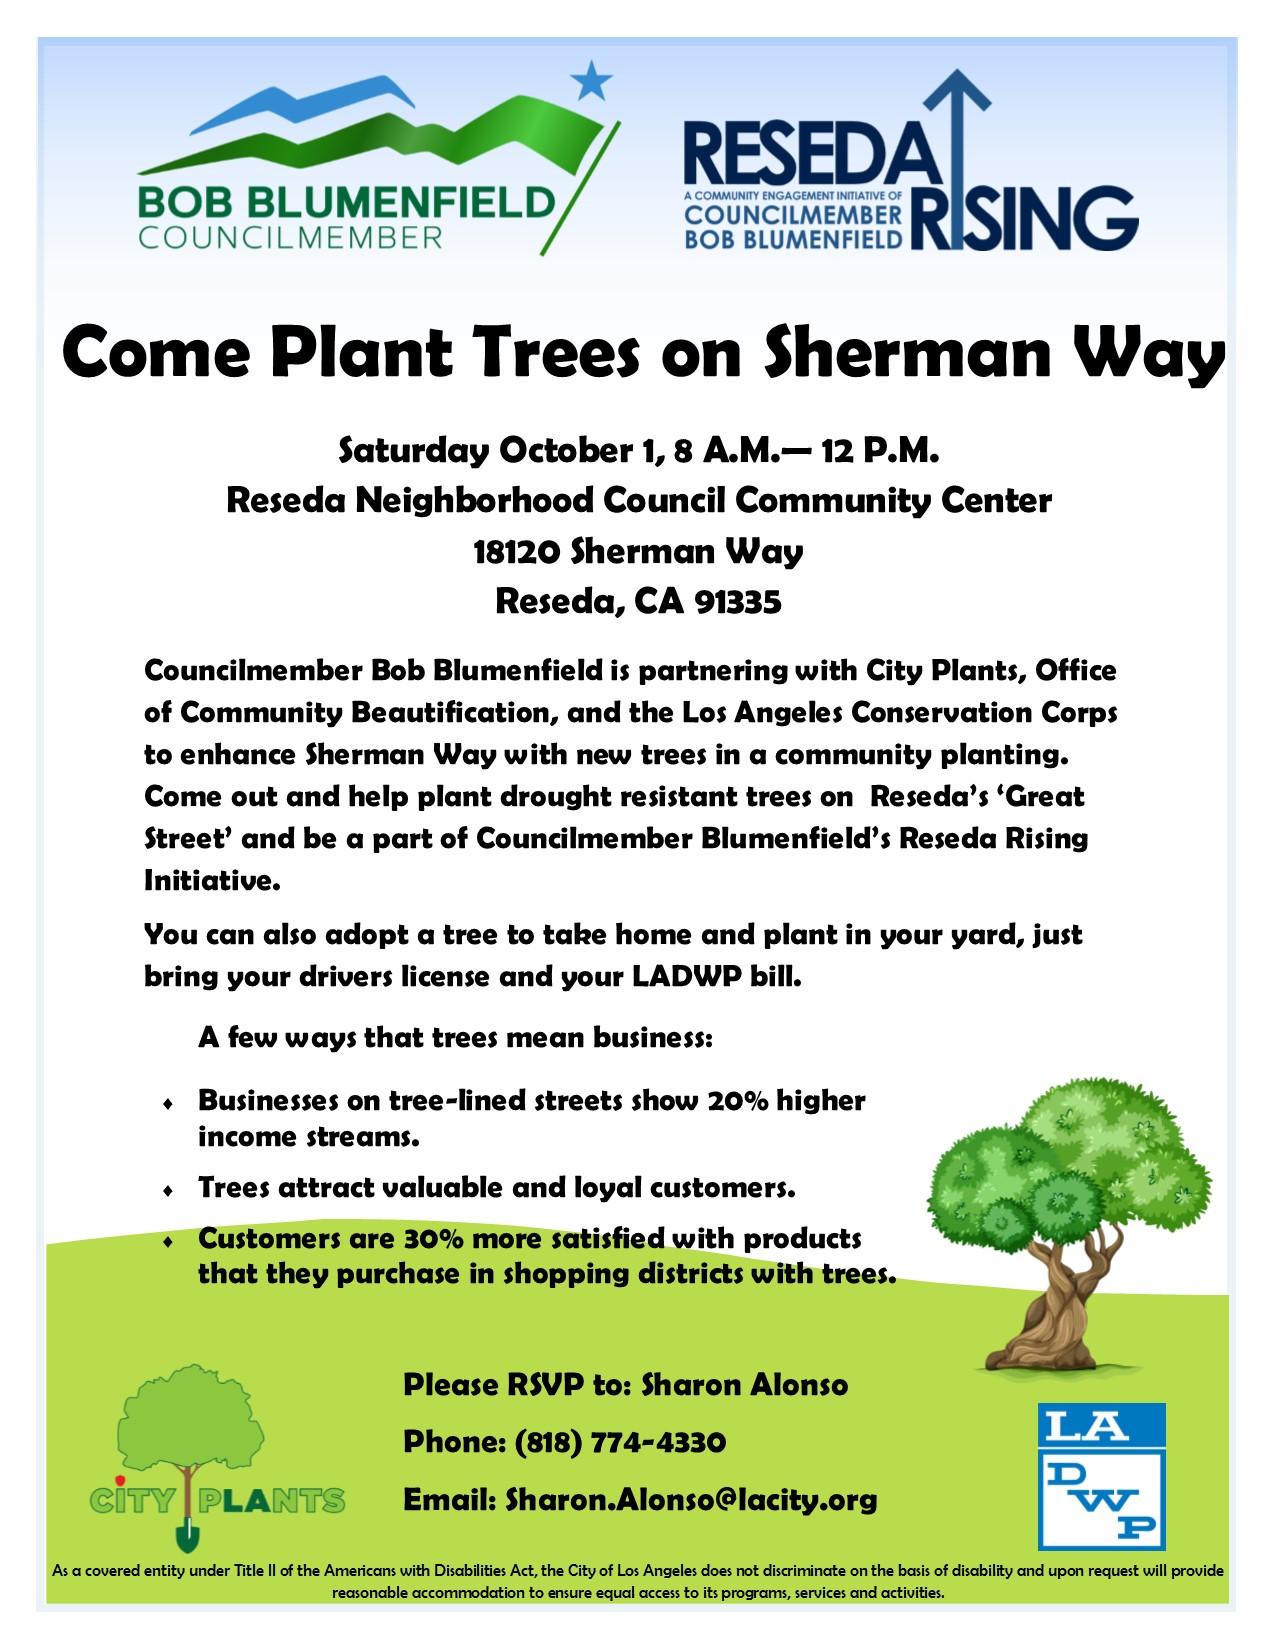 Sherman_Way_Tree_Planting_evnet_for_Tricia_FINALFINALFINAL.jpg